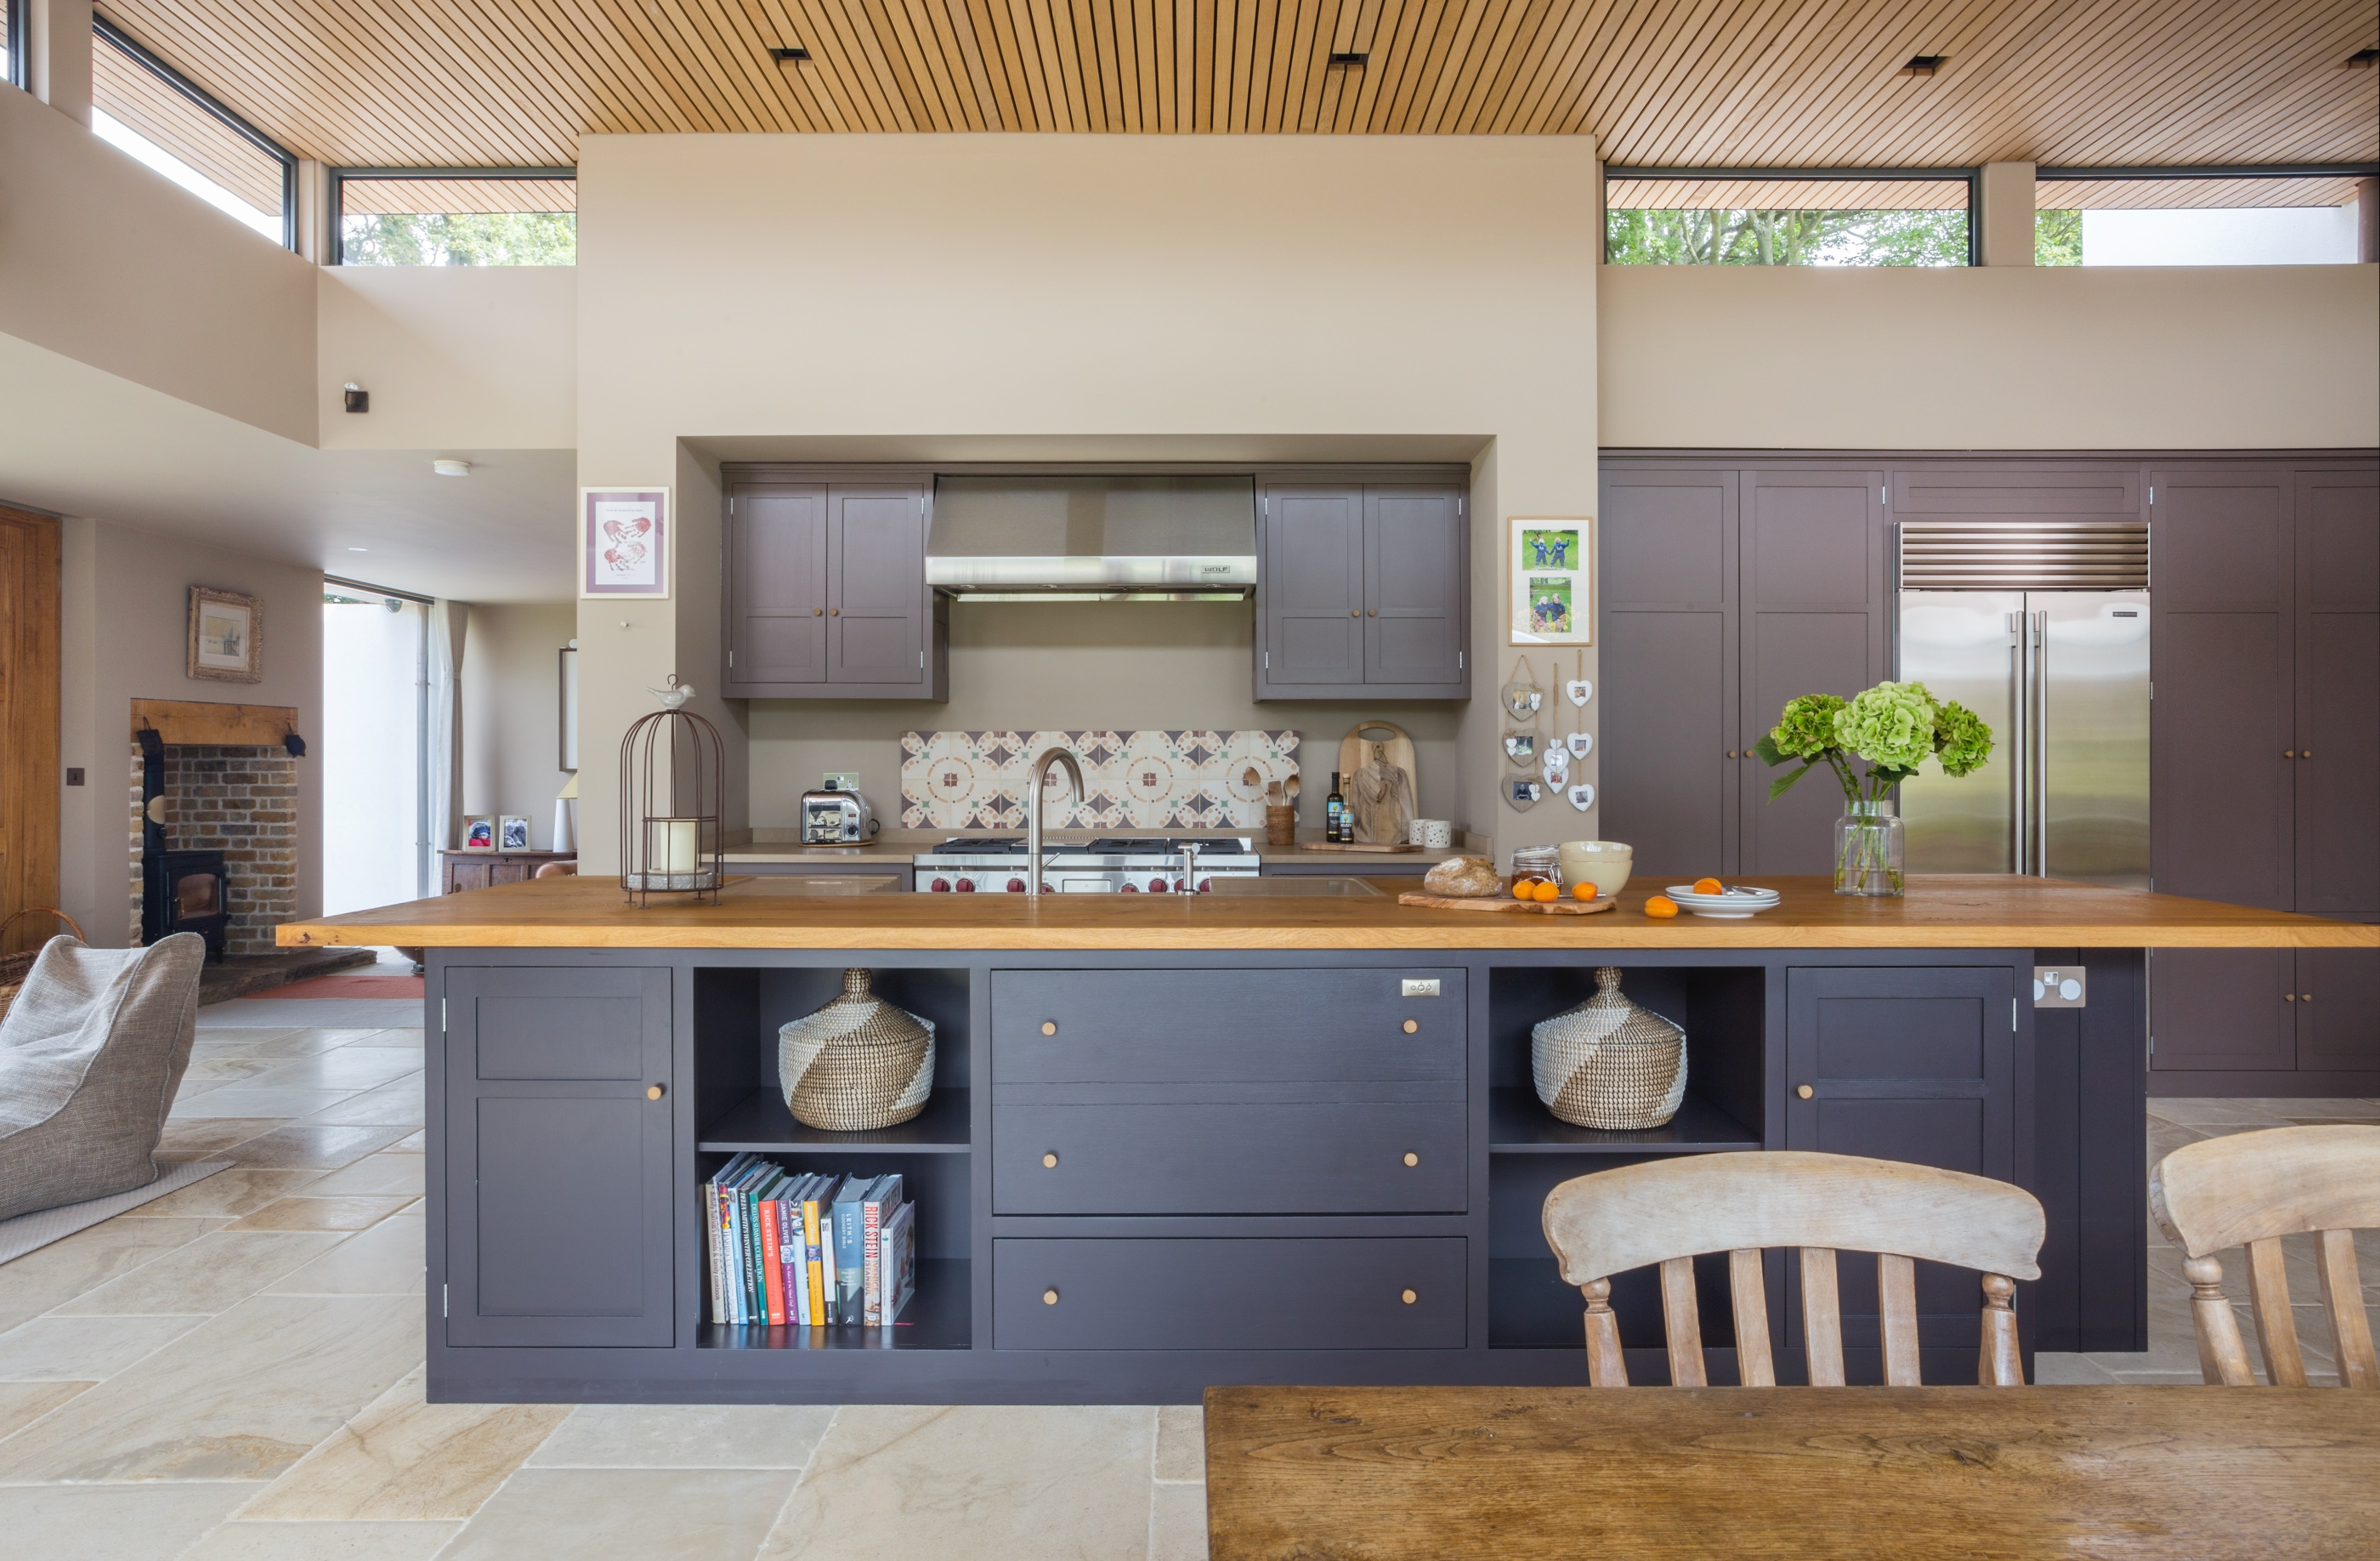 The World Of Interiors Index Charlie Kingham Bespoke Kitchens